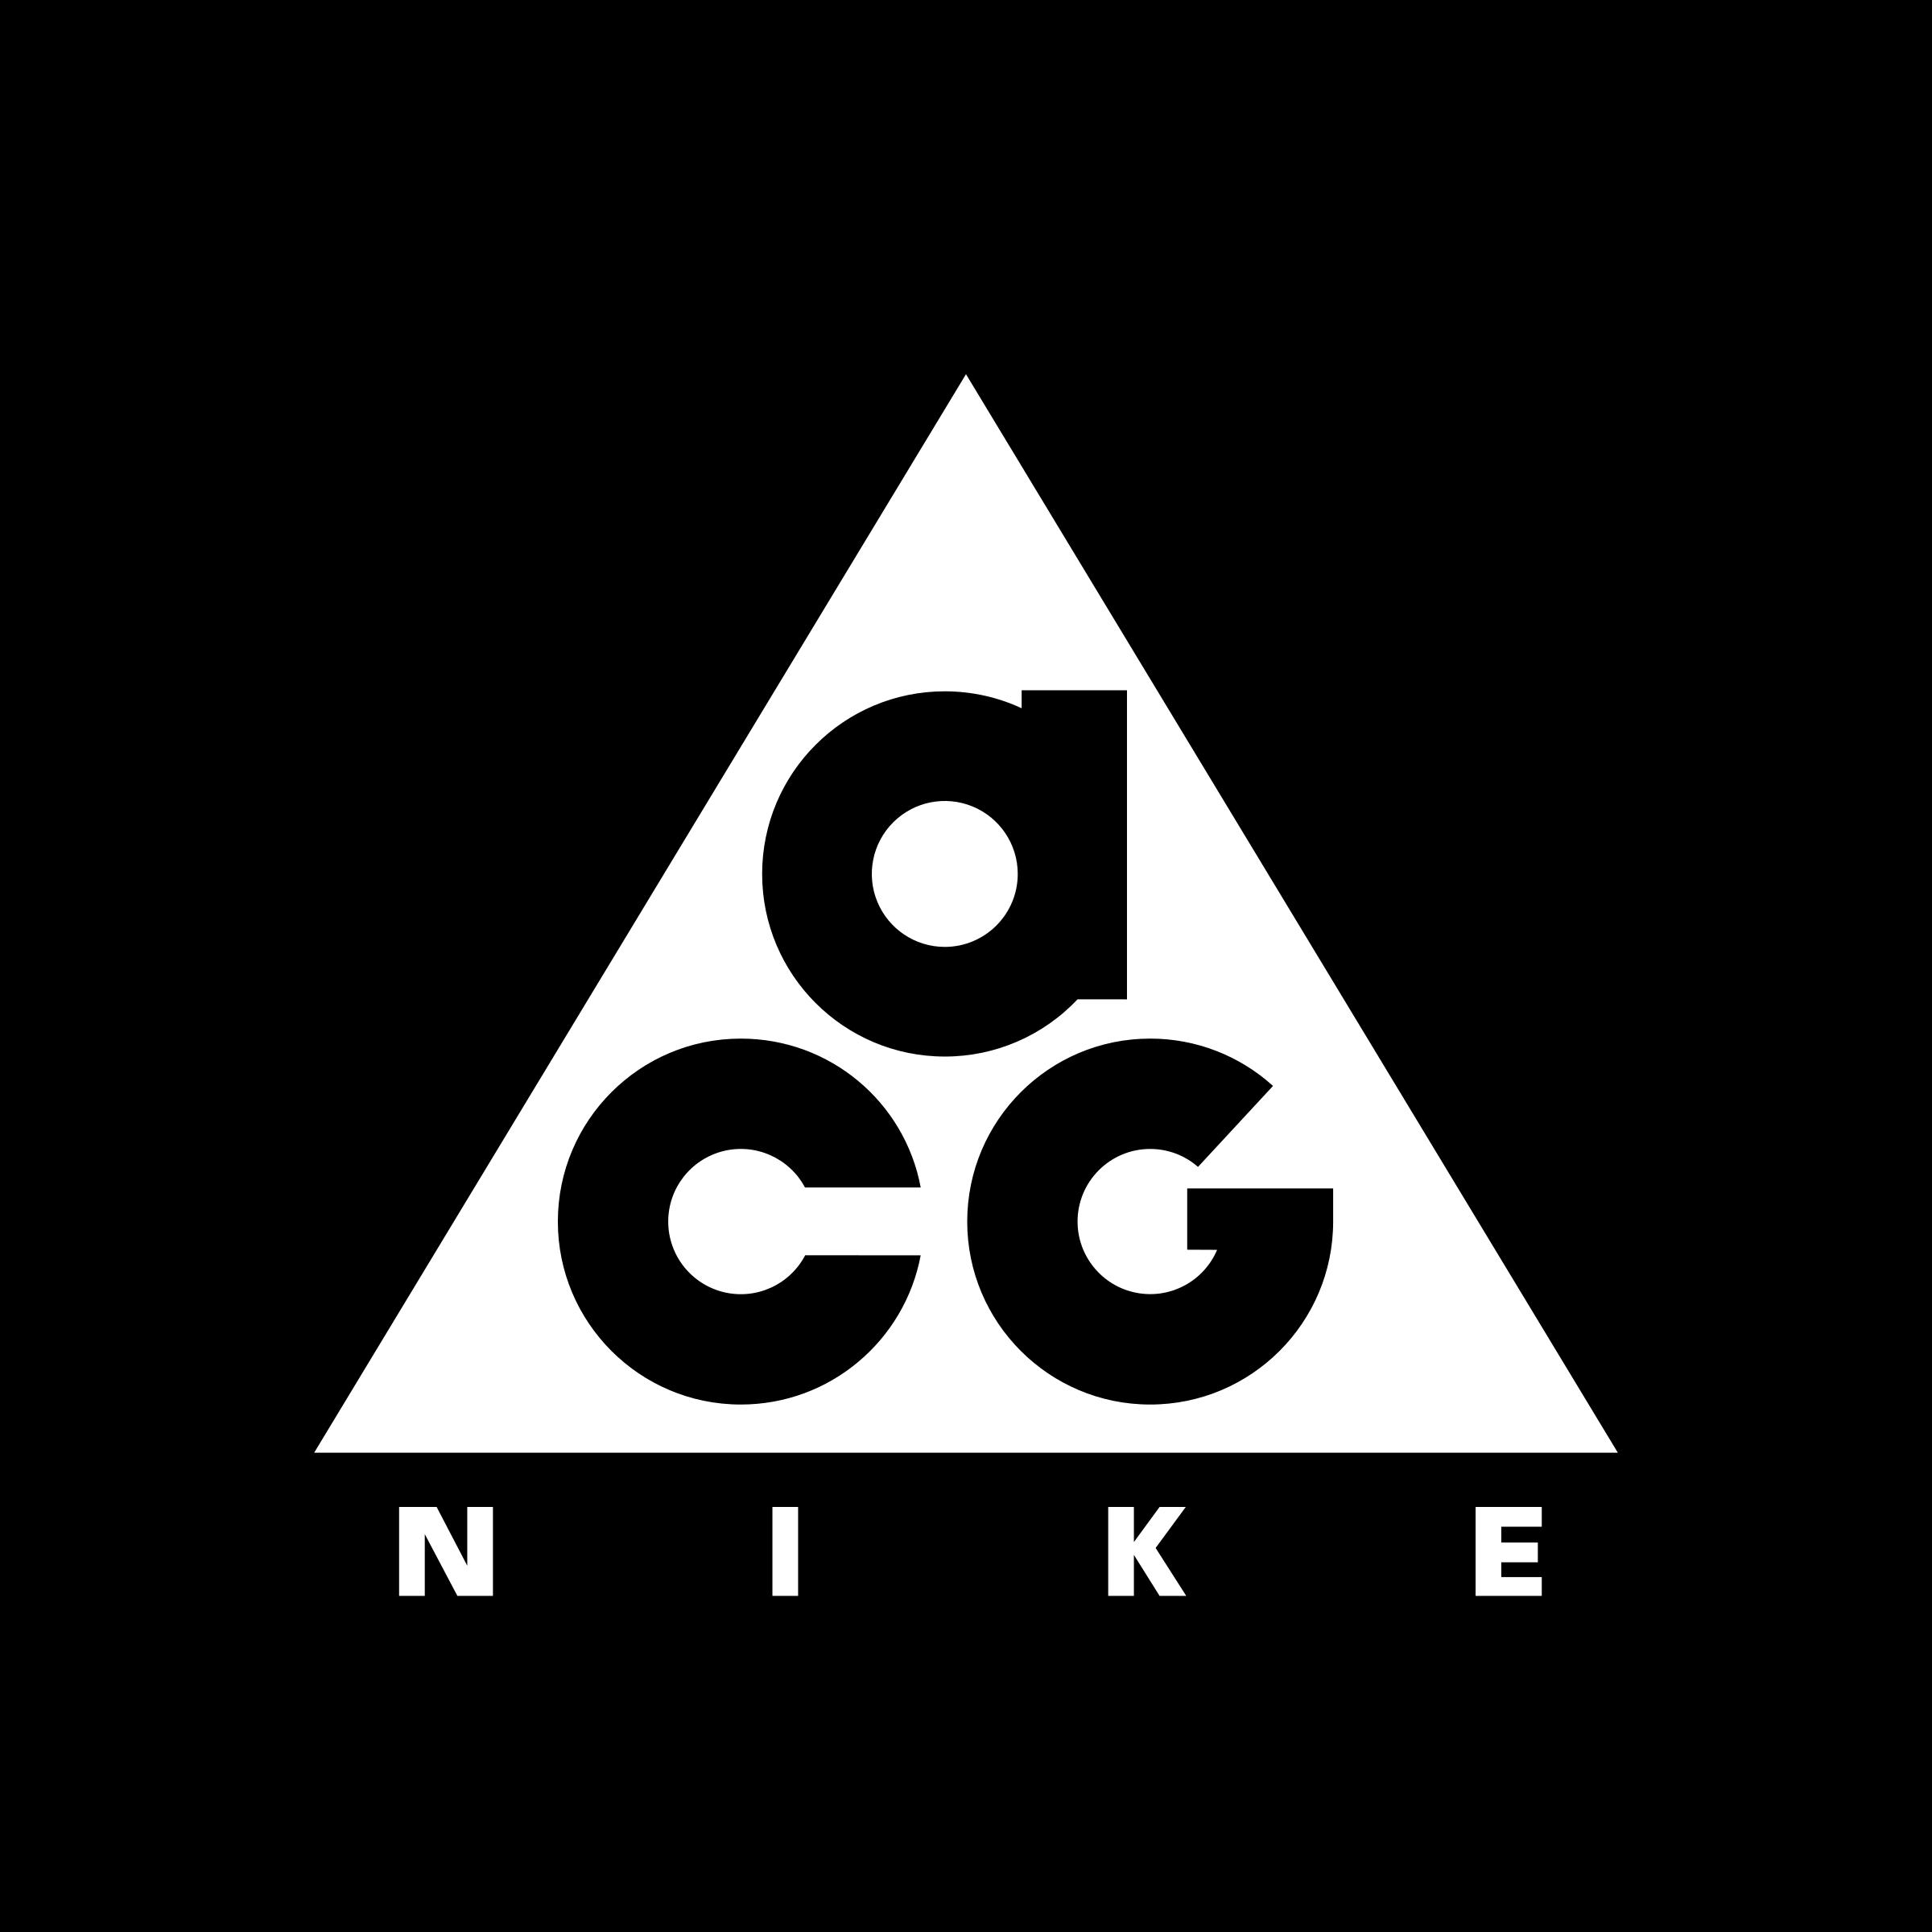 Nike ACG Logo PNG Transparent & SVG Vector - Freebie Supply